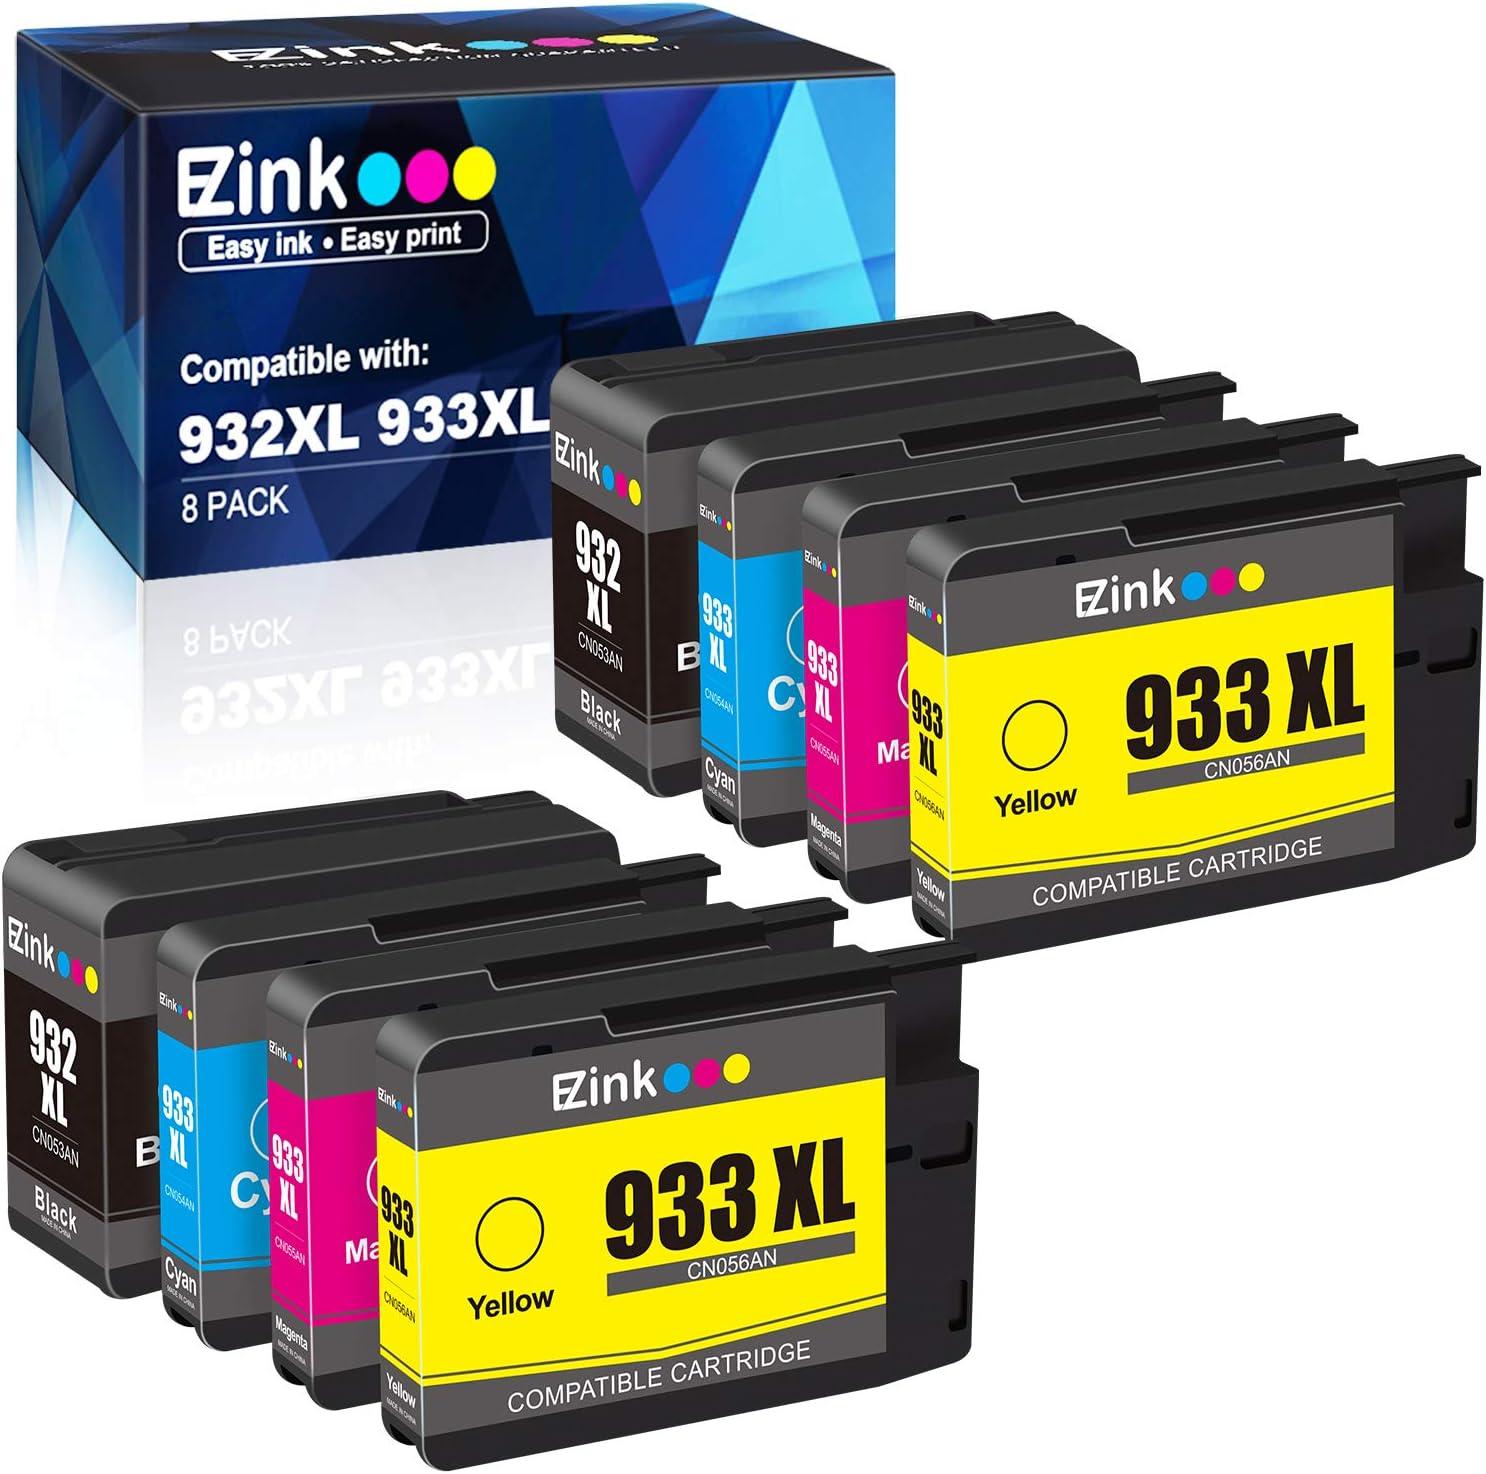 4-20P 932 933 XL Ink Cartridges for HP OfficeJet 6100 6600 7612 6700 Printer Lot